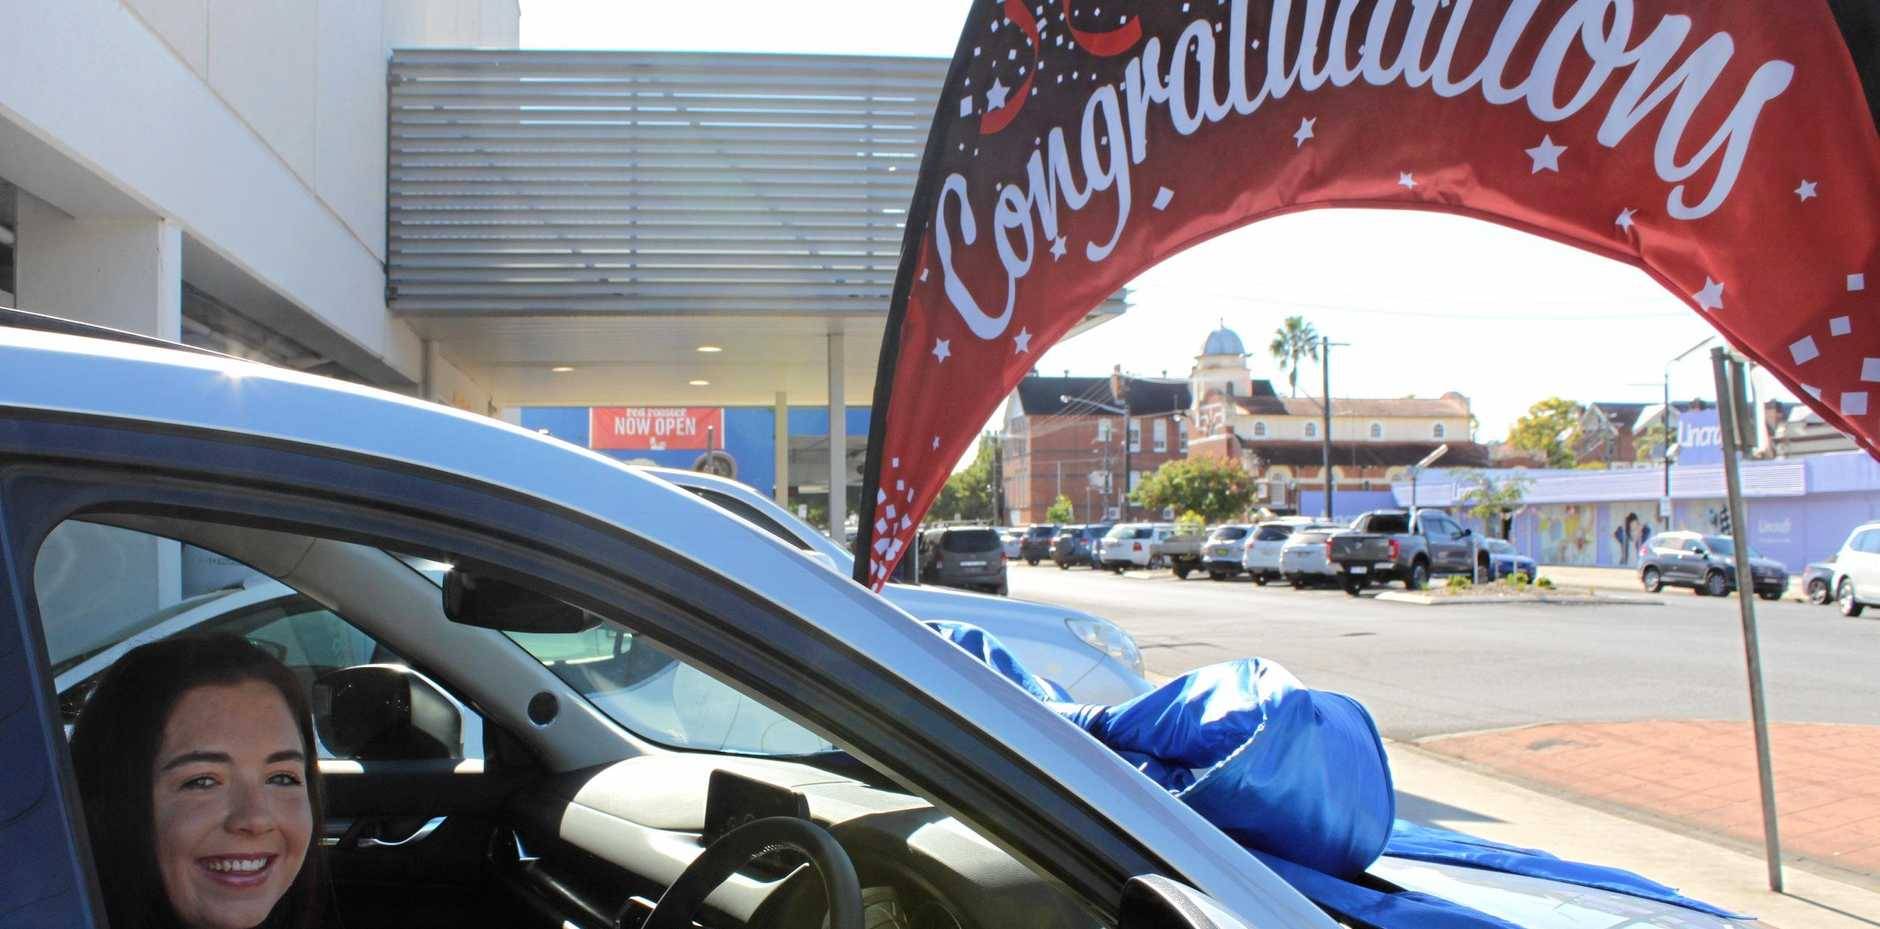 Emily McNamara won a Mazda CX-5 through the Children's Hospital Foundation summer raffle at Lismore Square.